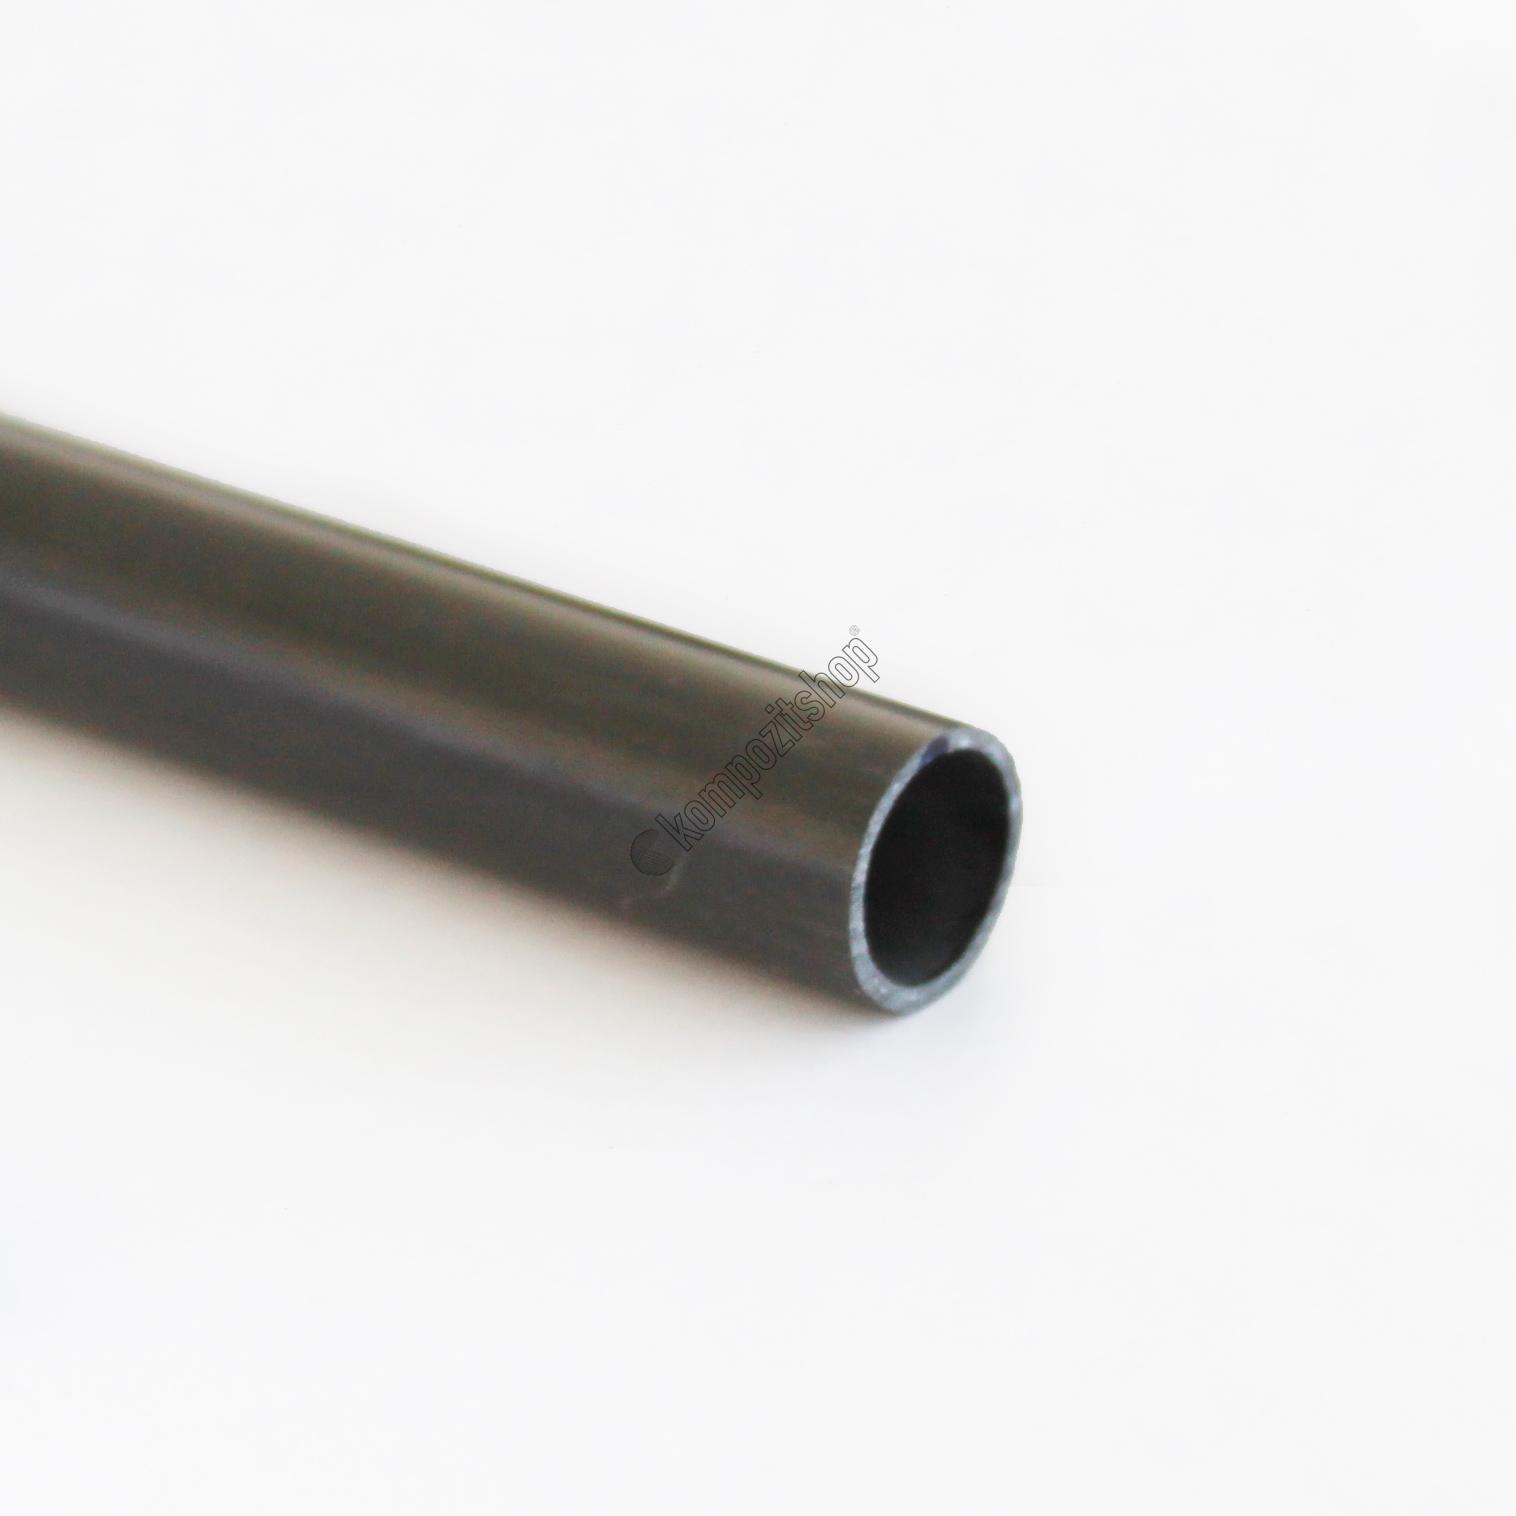 PROTUBE-CARBON - Karbon Fiber Boru Pro Dış/İç Çap:8mm/6mm